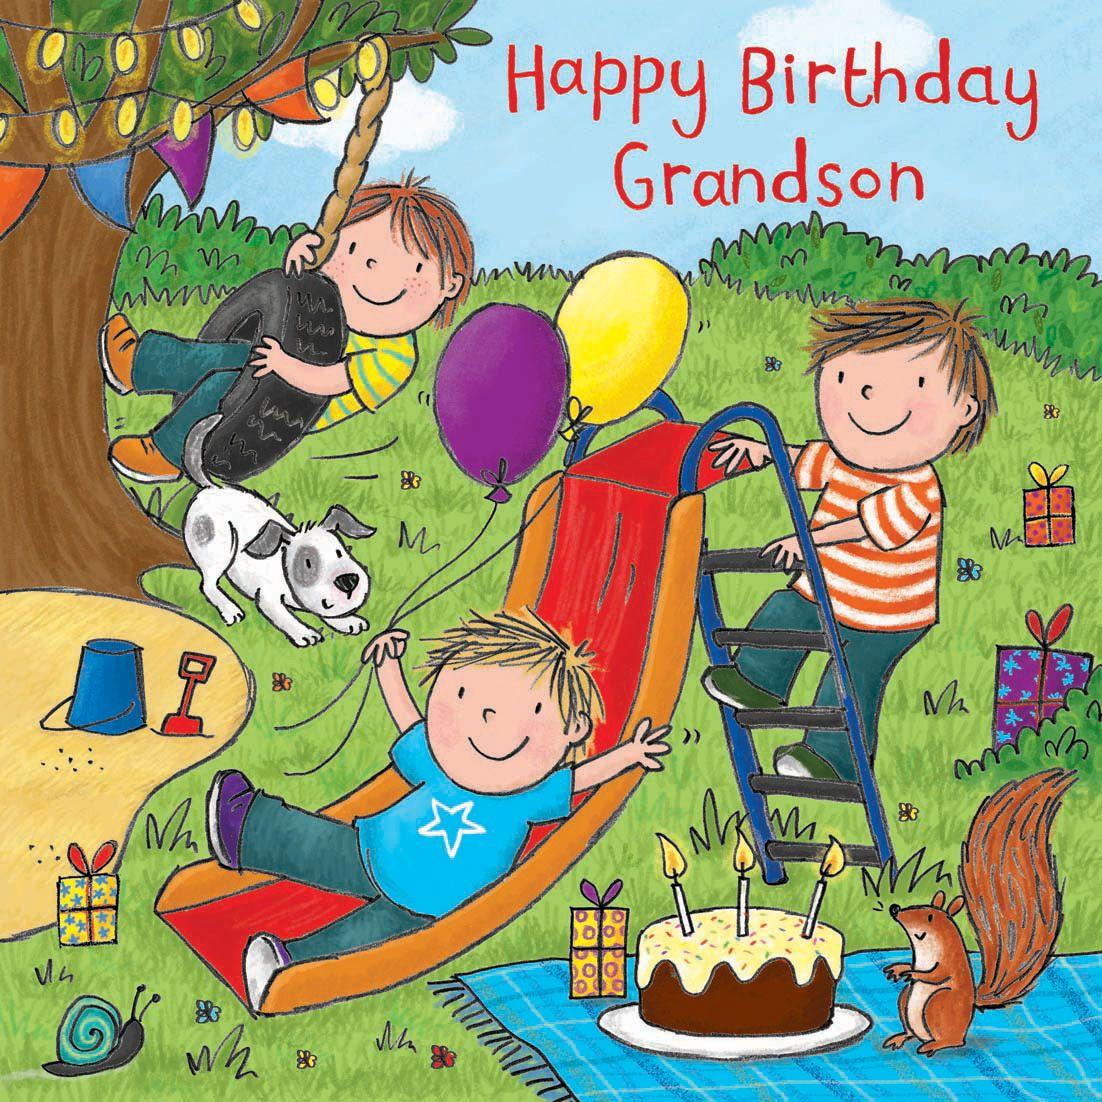 Happy Birthday Grandson Card With Milo TW728